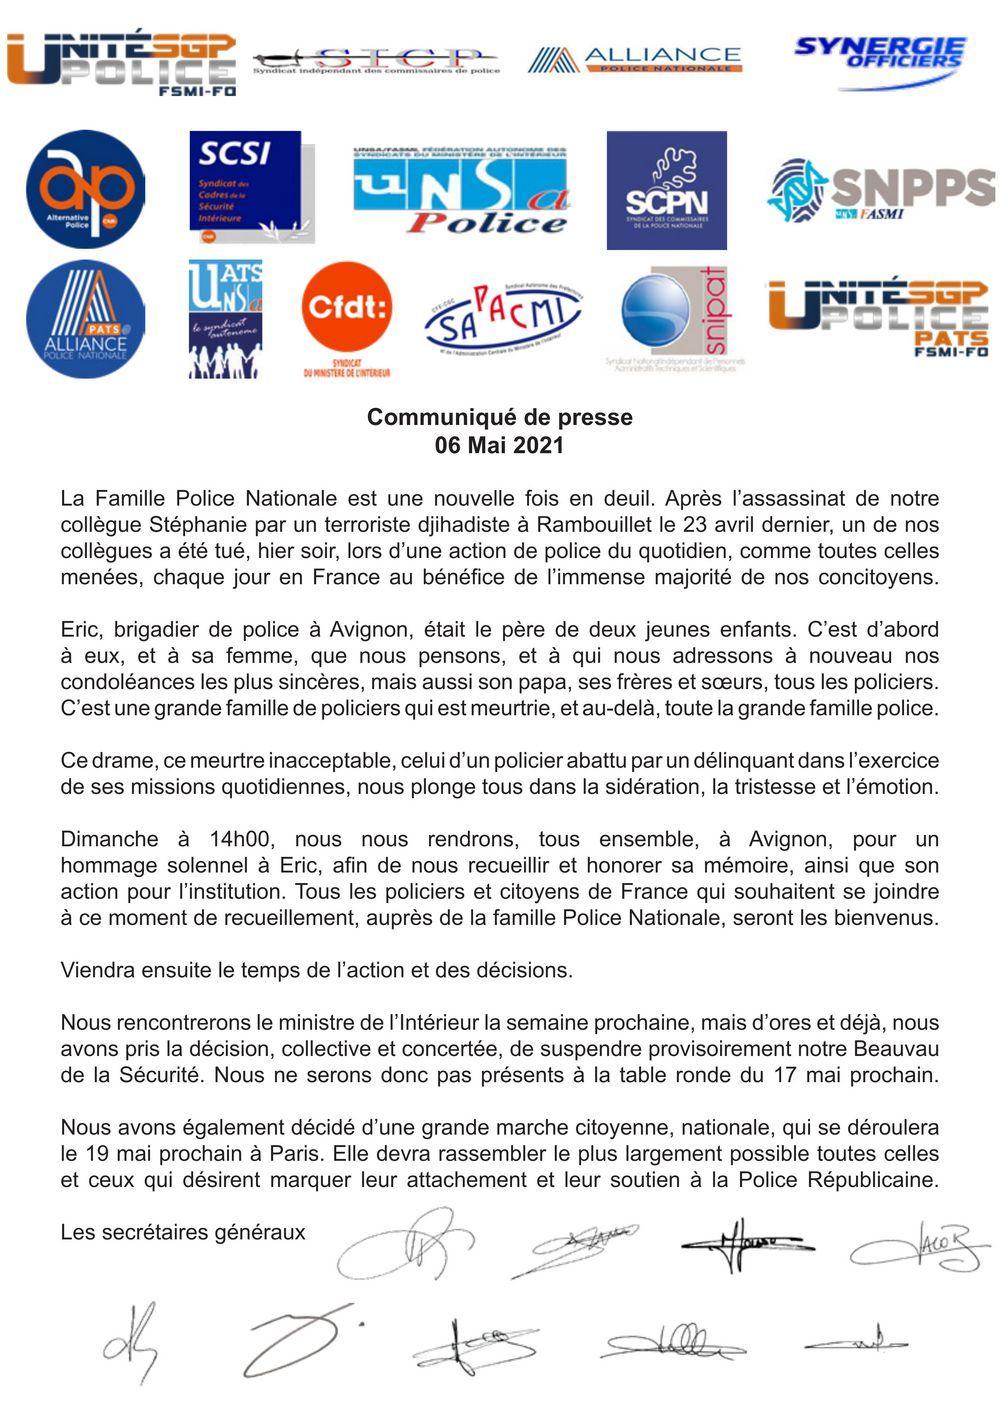 Communiqué de presse Intersyndicale du 6 mai 2021